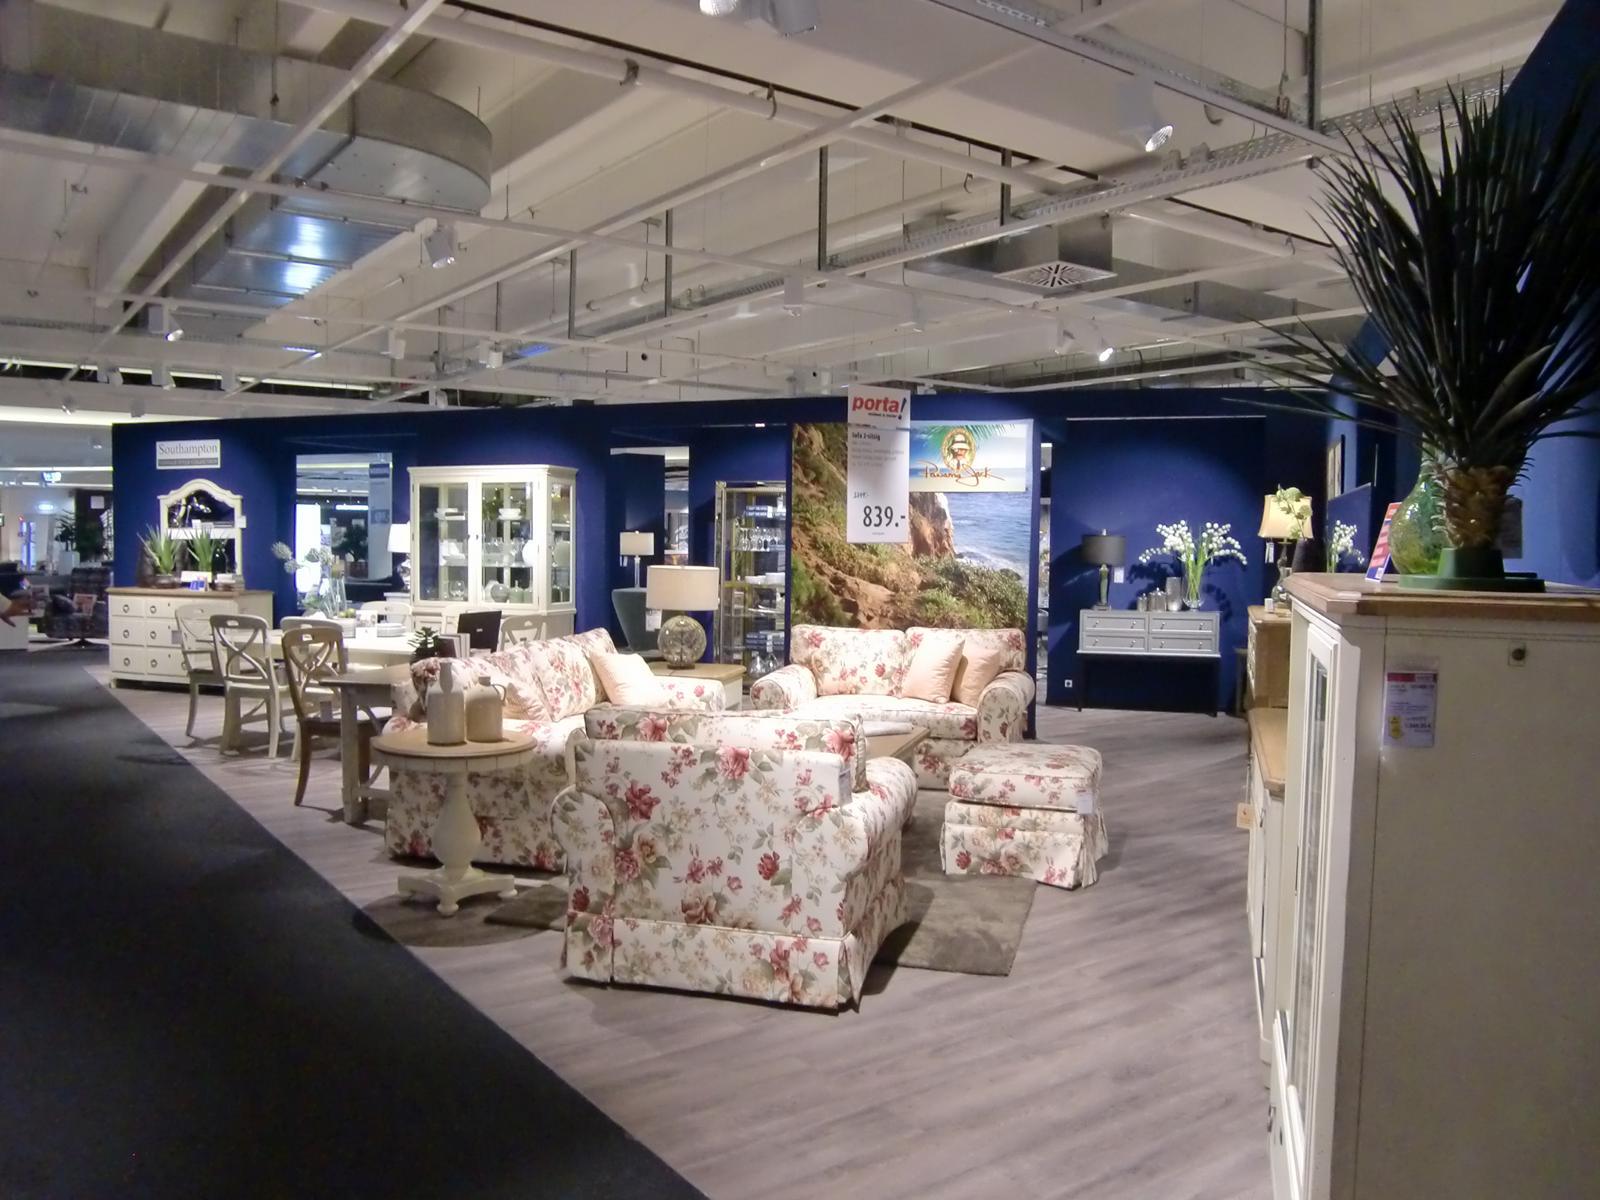 porta berlin mahlsdorf 9 sch ffer american home. Black Bedroom Furniture Sets. Home Design Ideas